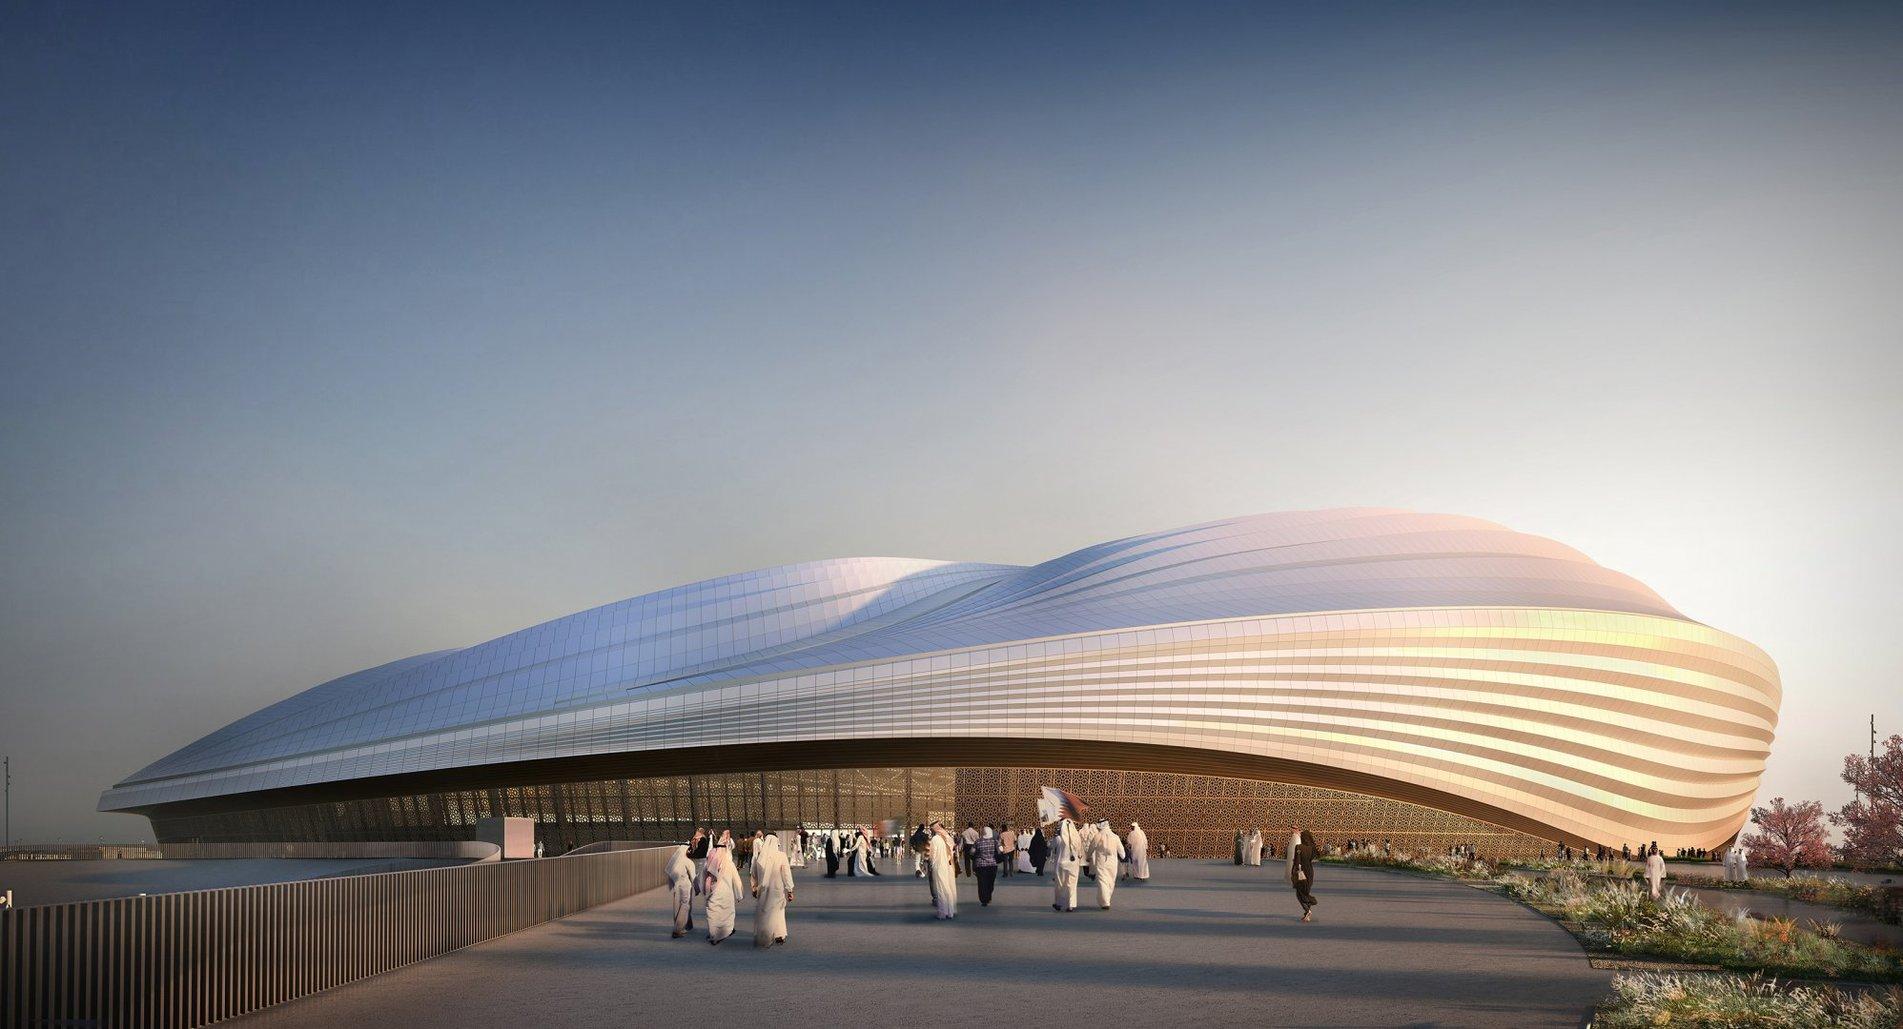 Al-Wakrah SC Stadion